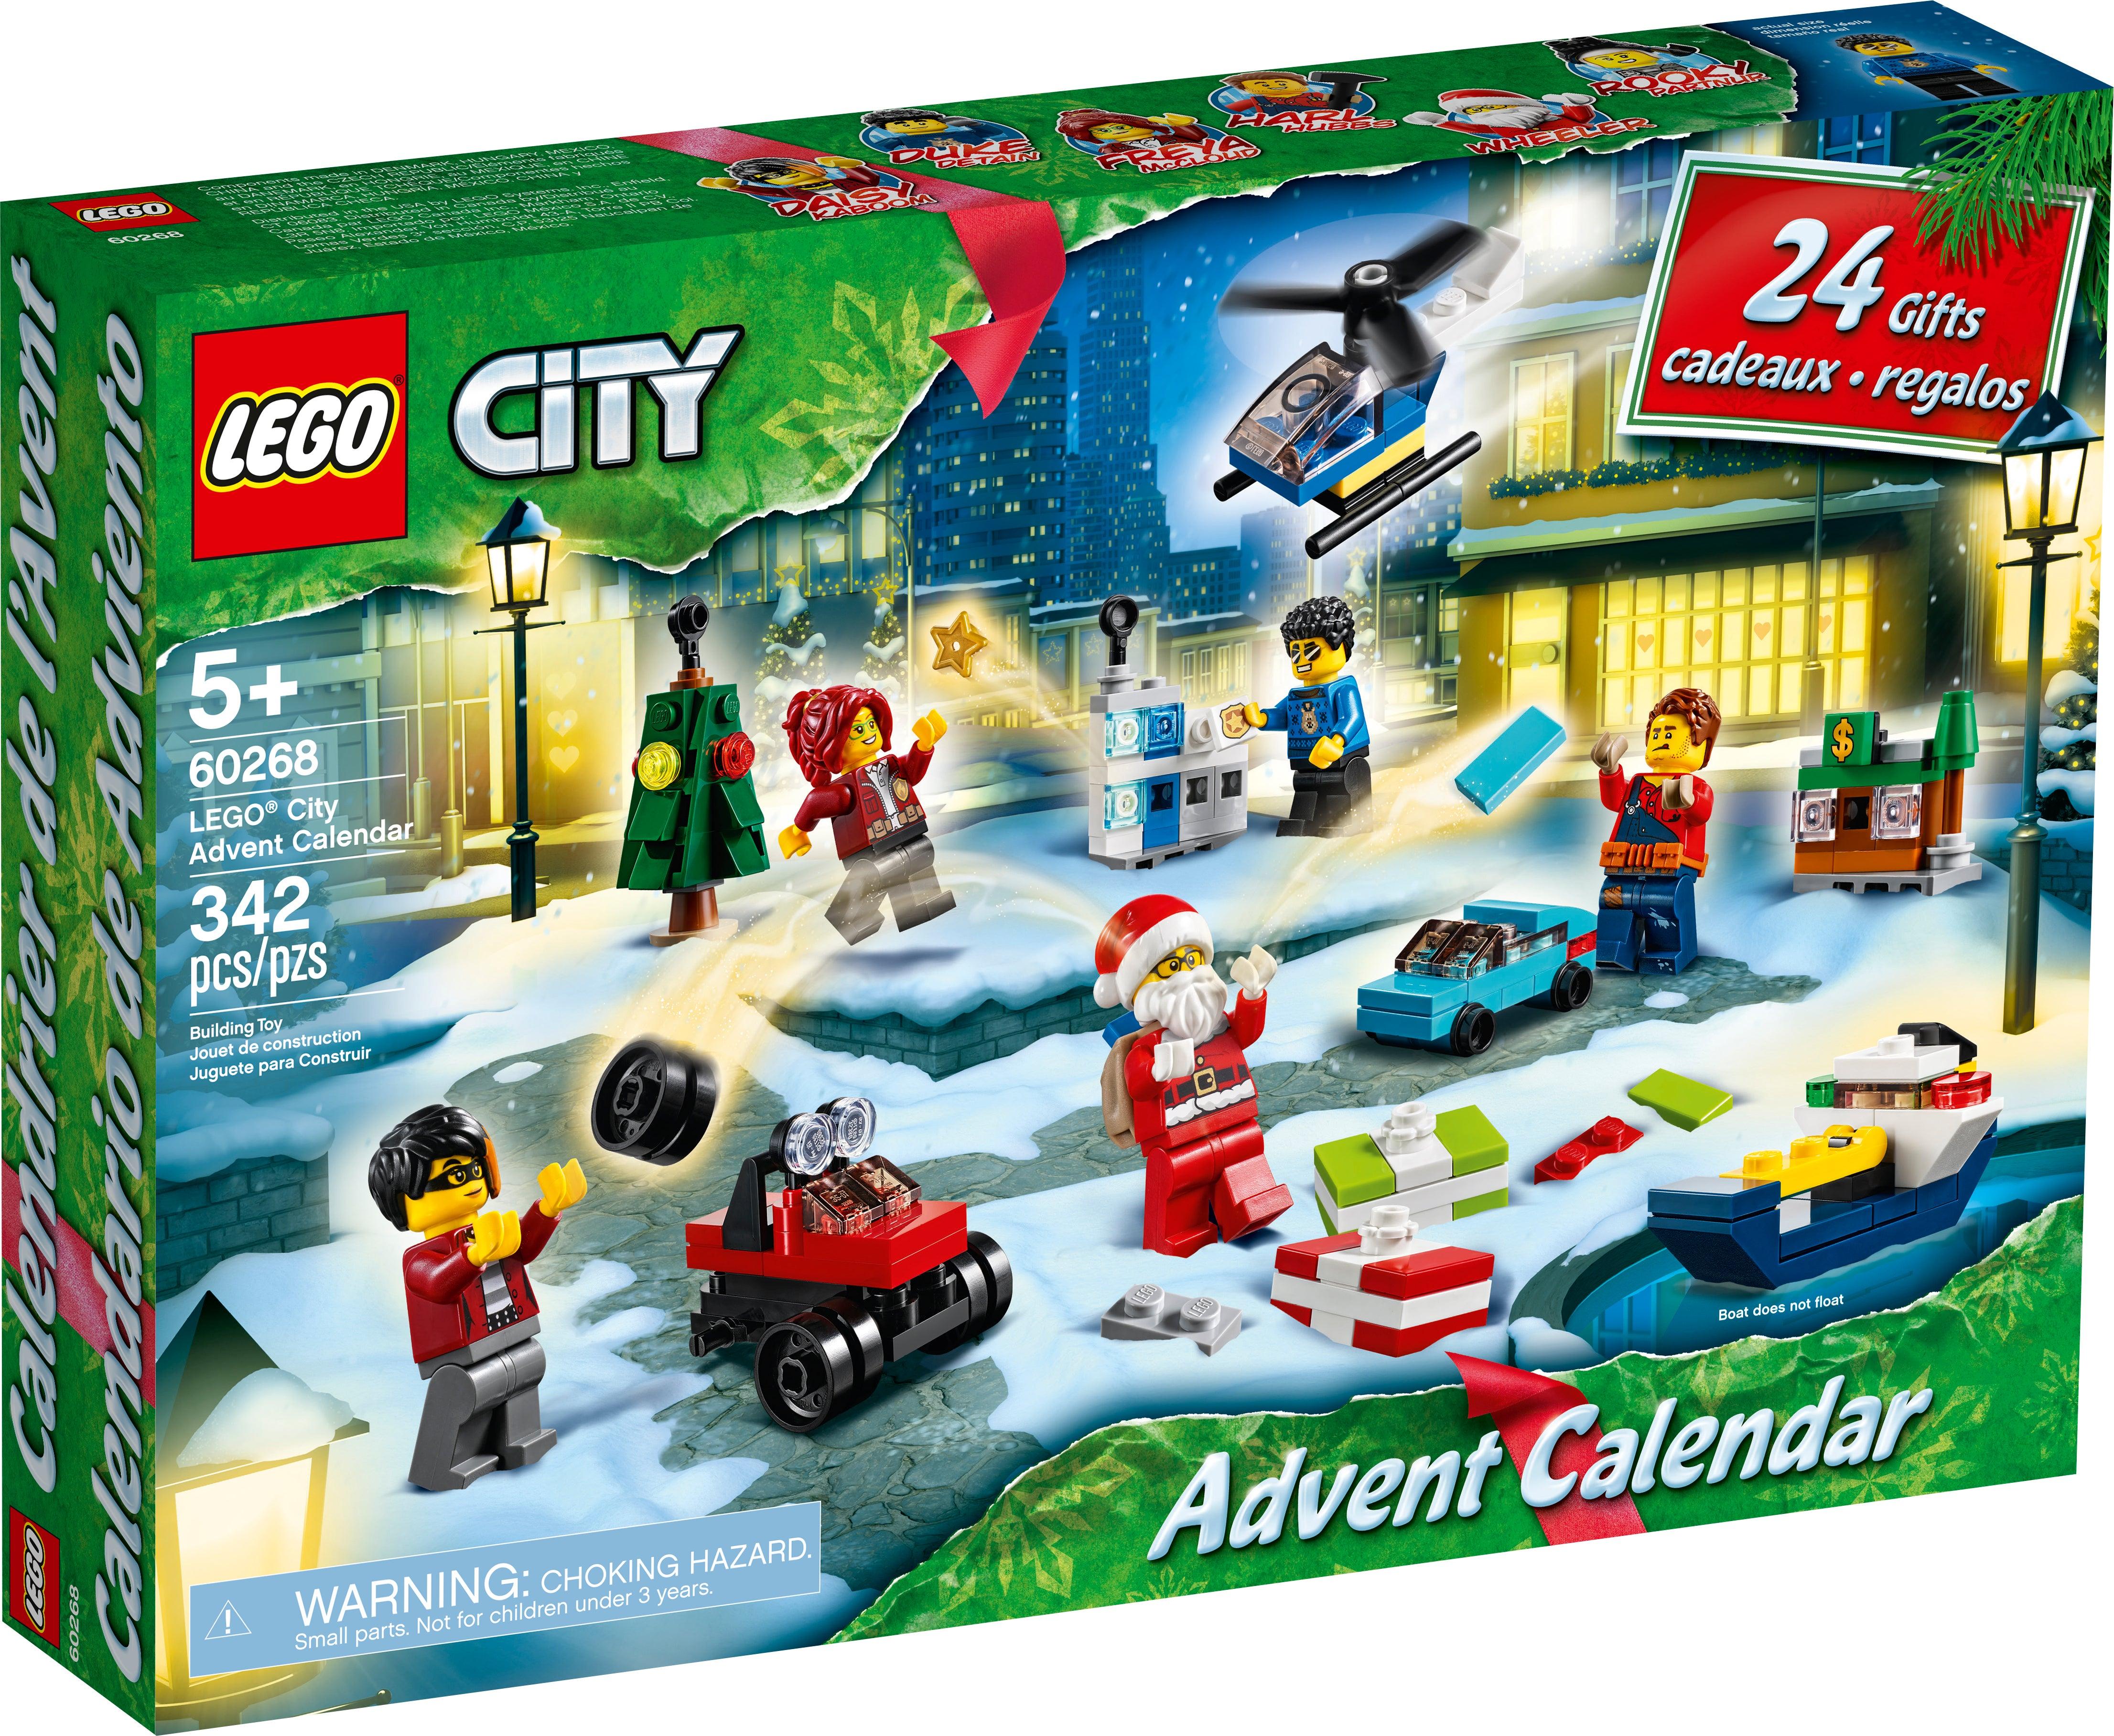 Lego October 2022 Calendar.Lego Complete Sets Packs Toys Hobbies Lego City Advent Calendar 24 Gifts 60268 Brand New